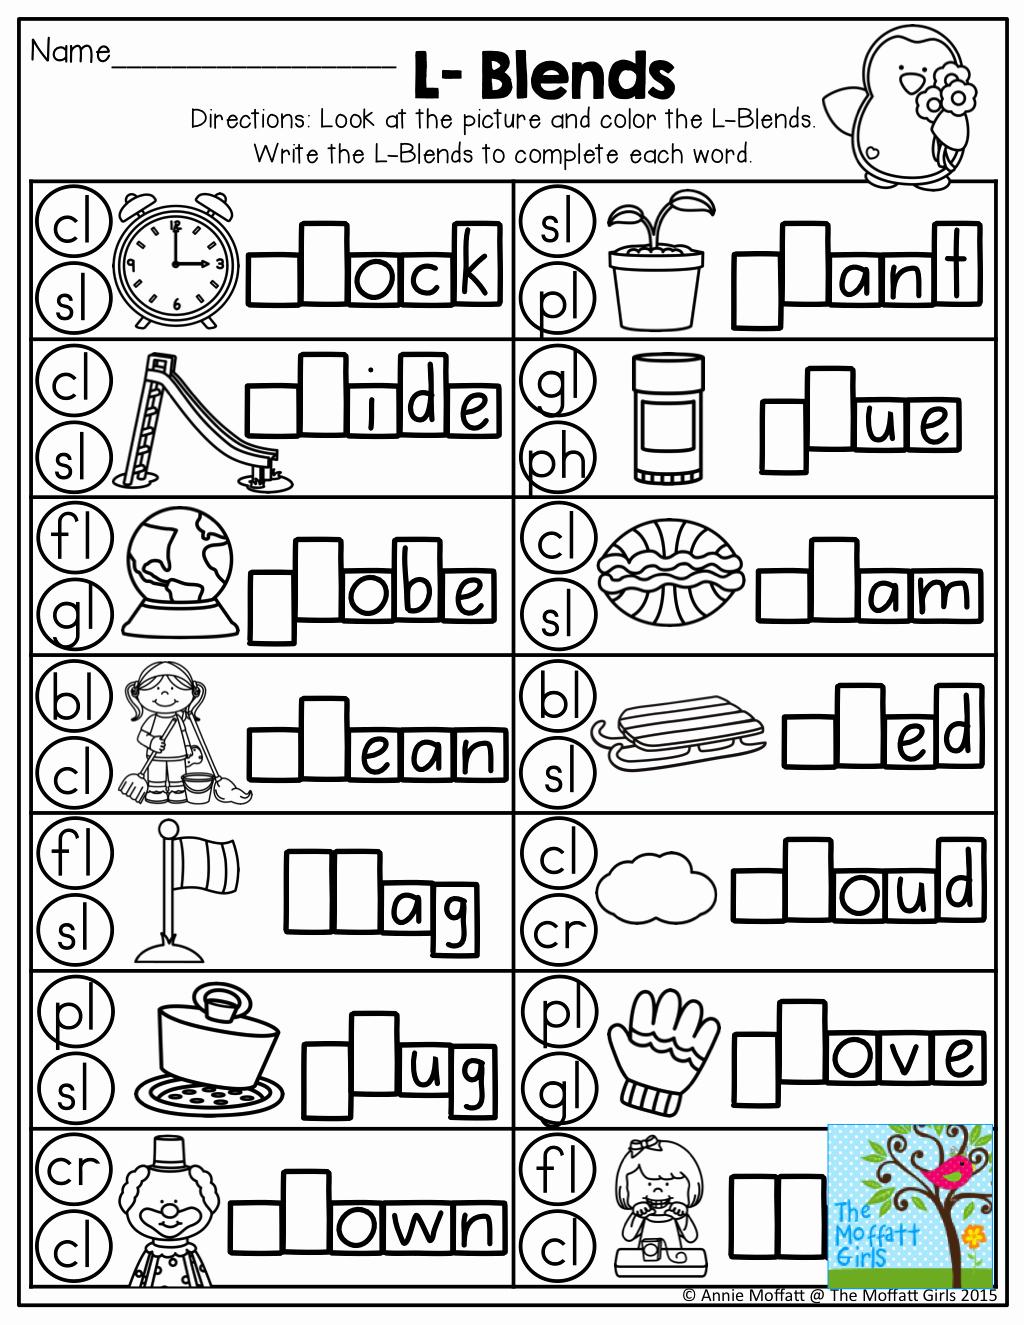 Blends Worksheet for First Grade Luxury Best 25 L Blends Ideas On Pinterest